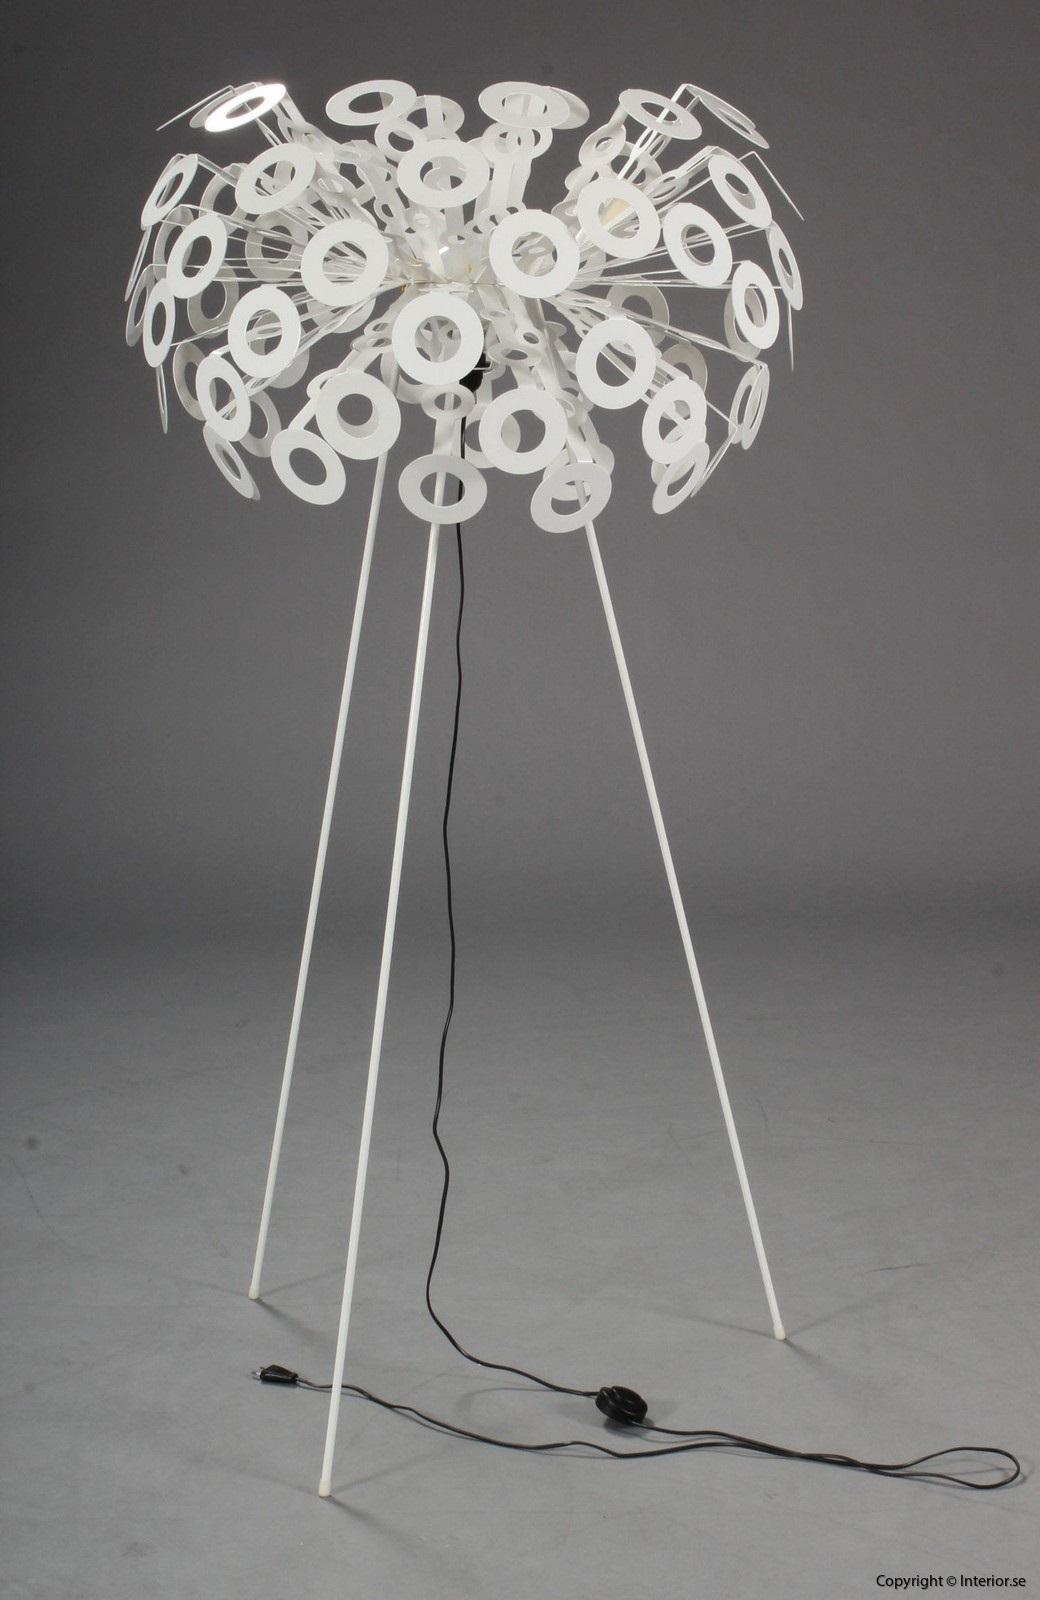 1 Golvlampa floor lampa stehluchte Moooi Dandelion - Richard Hutten